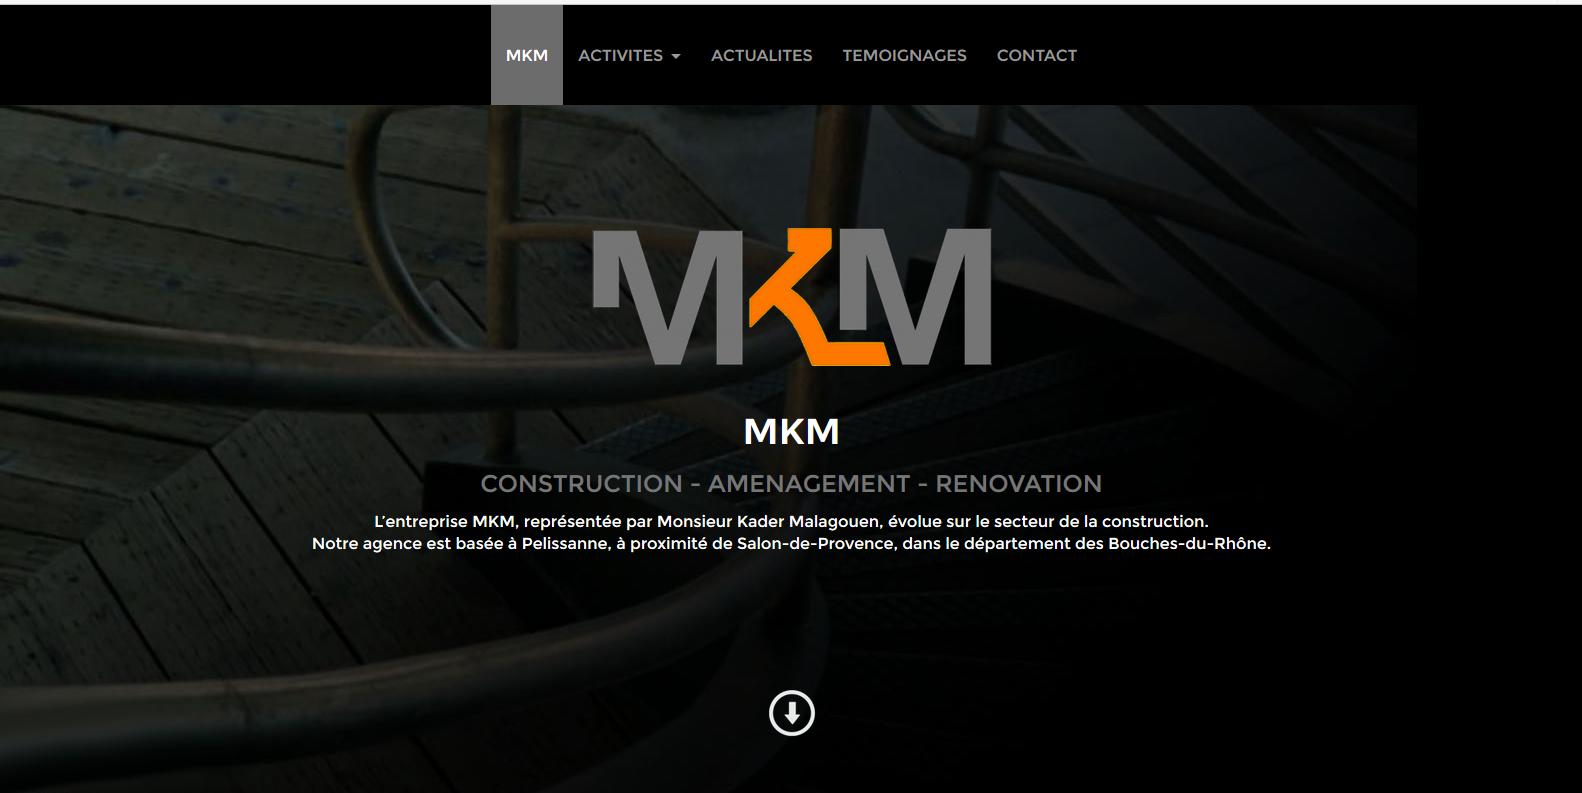 Mkmconstructions